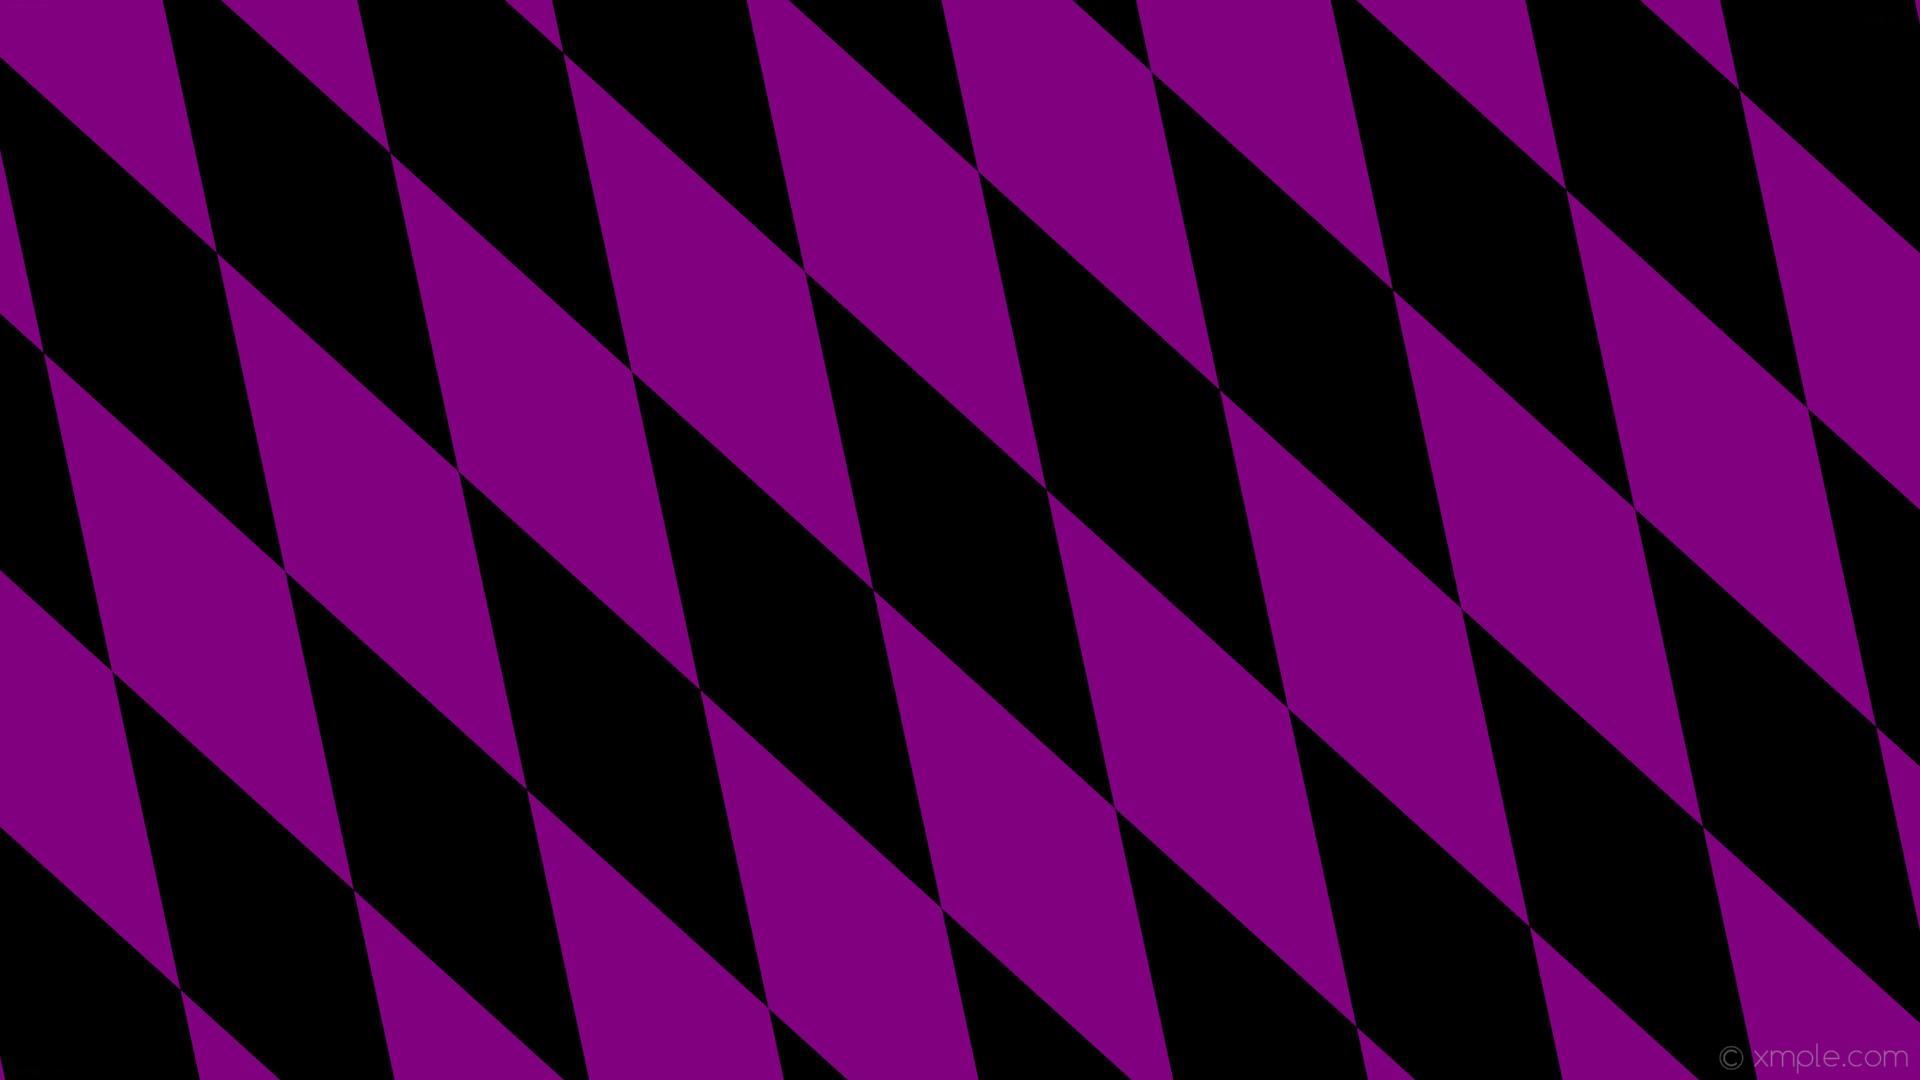 wallpaper rhombus black purple diamond lozenge #000000 #800080 120° 620px  200px